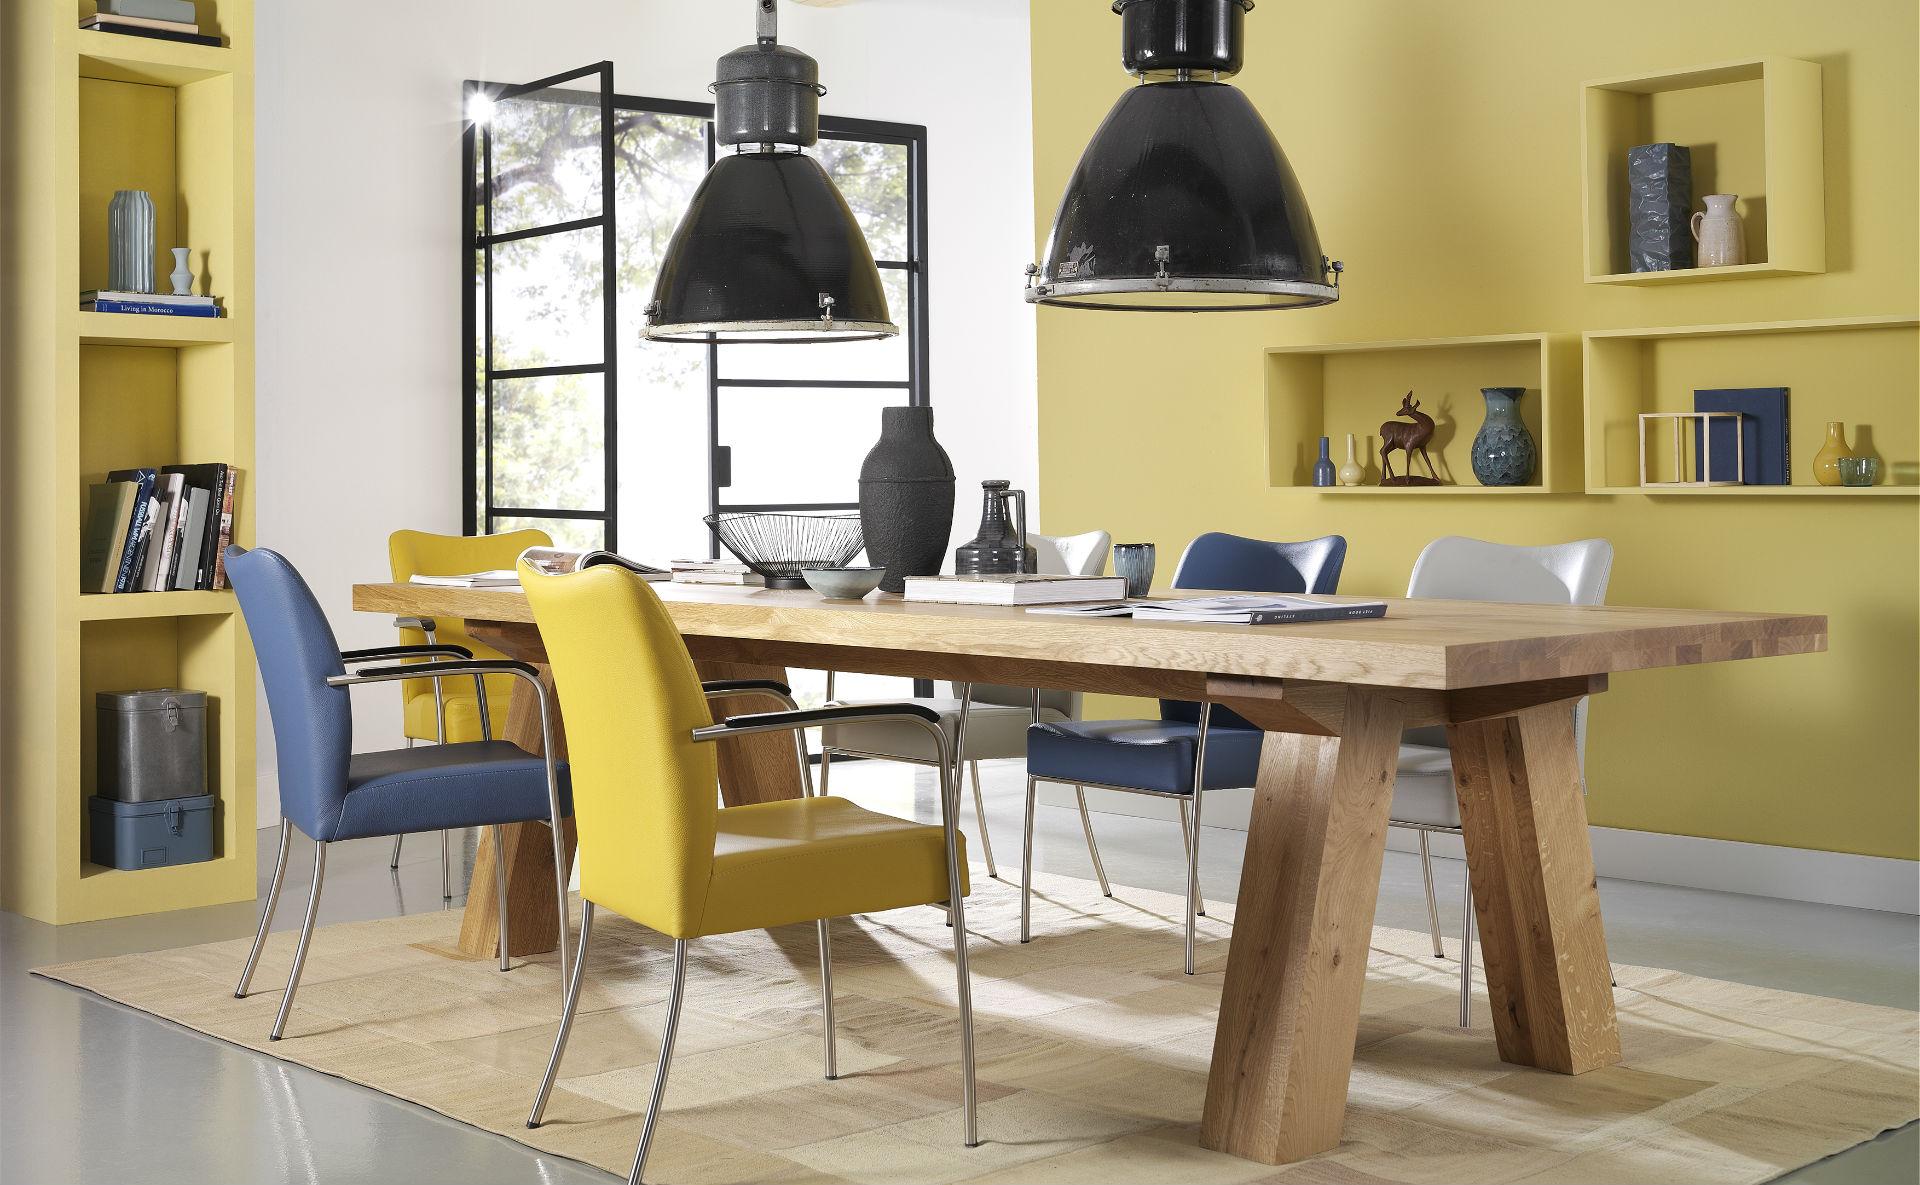 domatoria bert plantagie. Black Bedroom Furniture Sets. Home Design Ideas